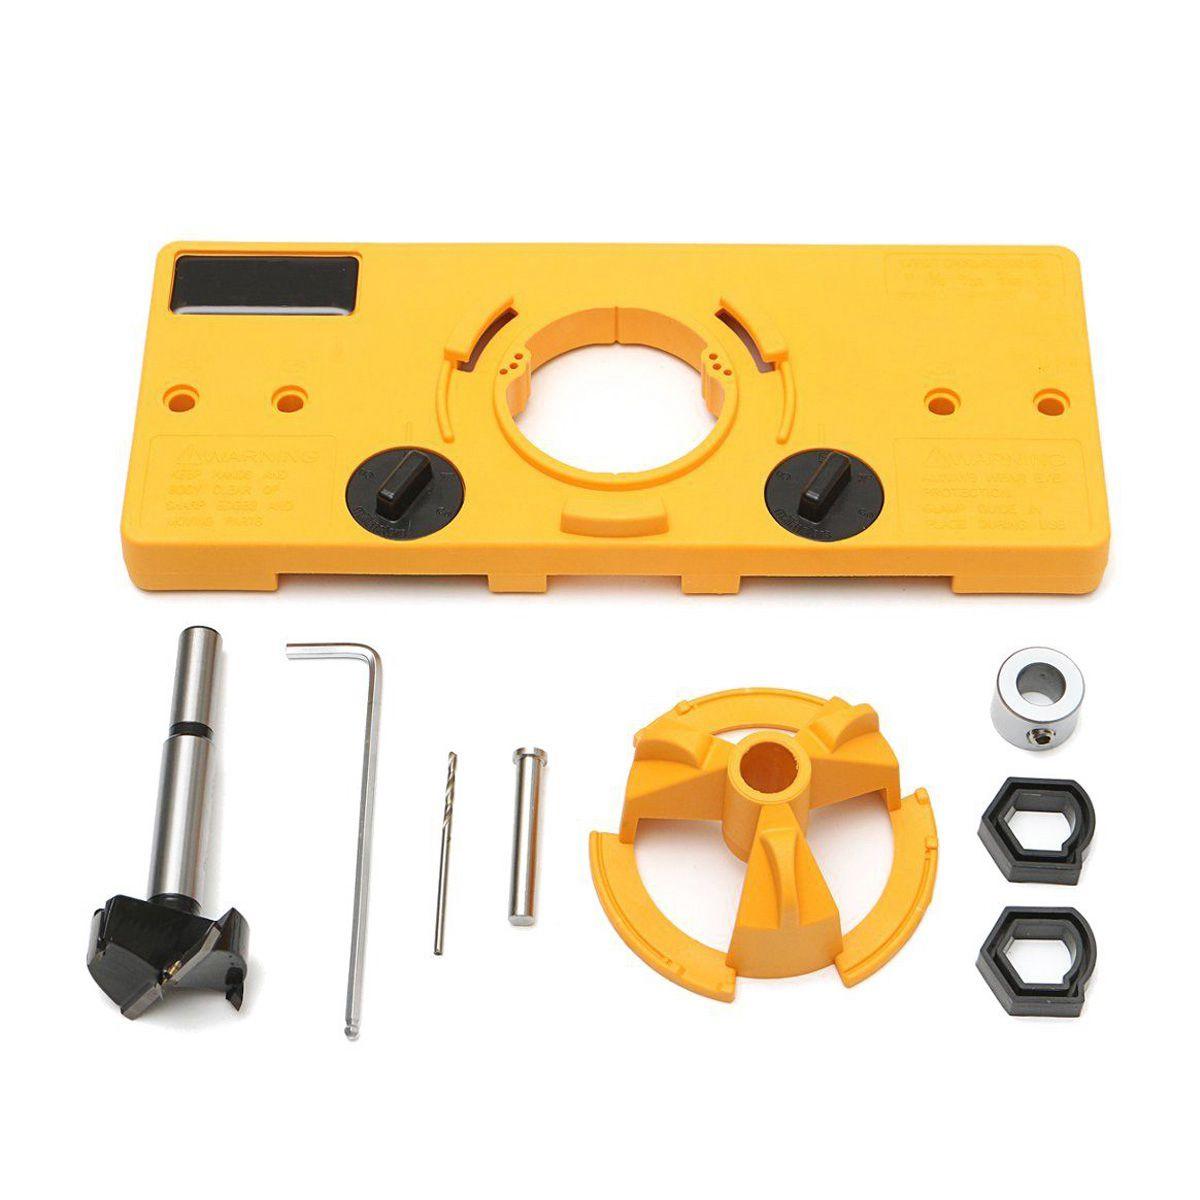 35mm Forstner Hinge Hole Saw Jig Drilling Guide Locator Hole Opener Door Cabinets DIY Woodworking Tool